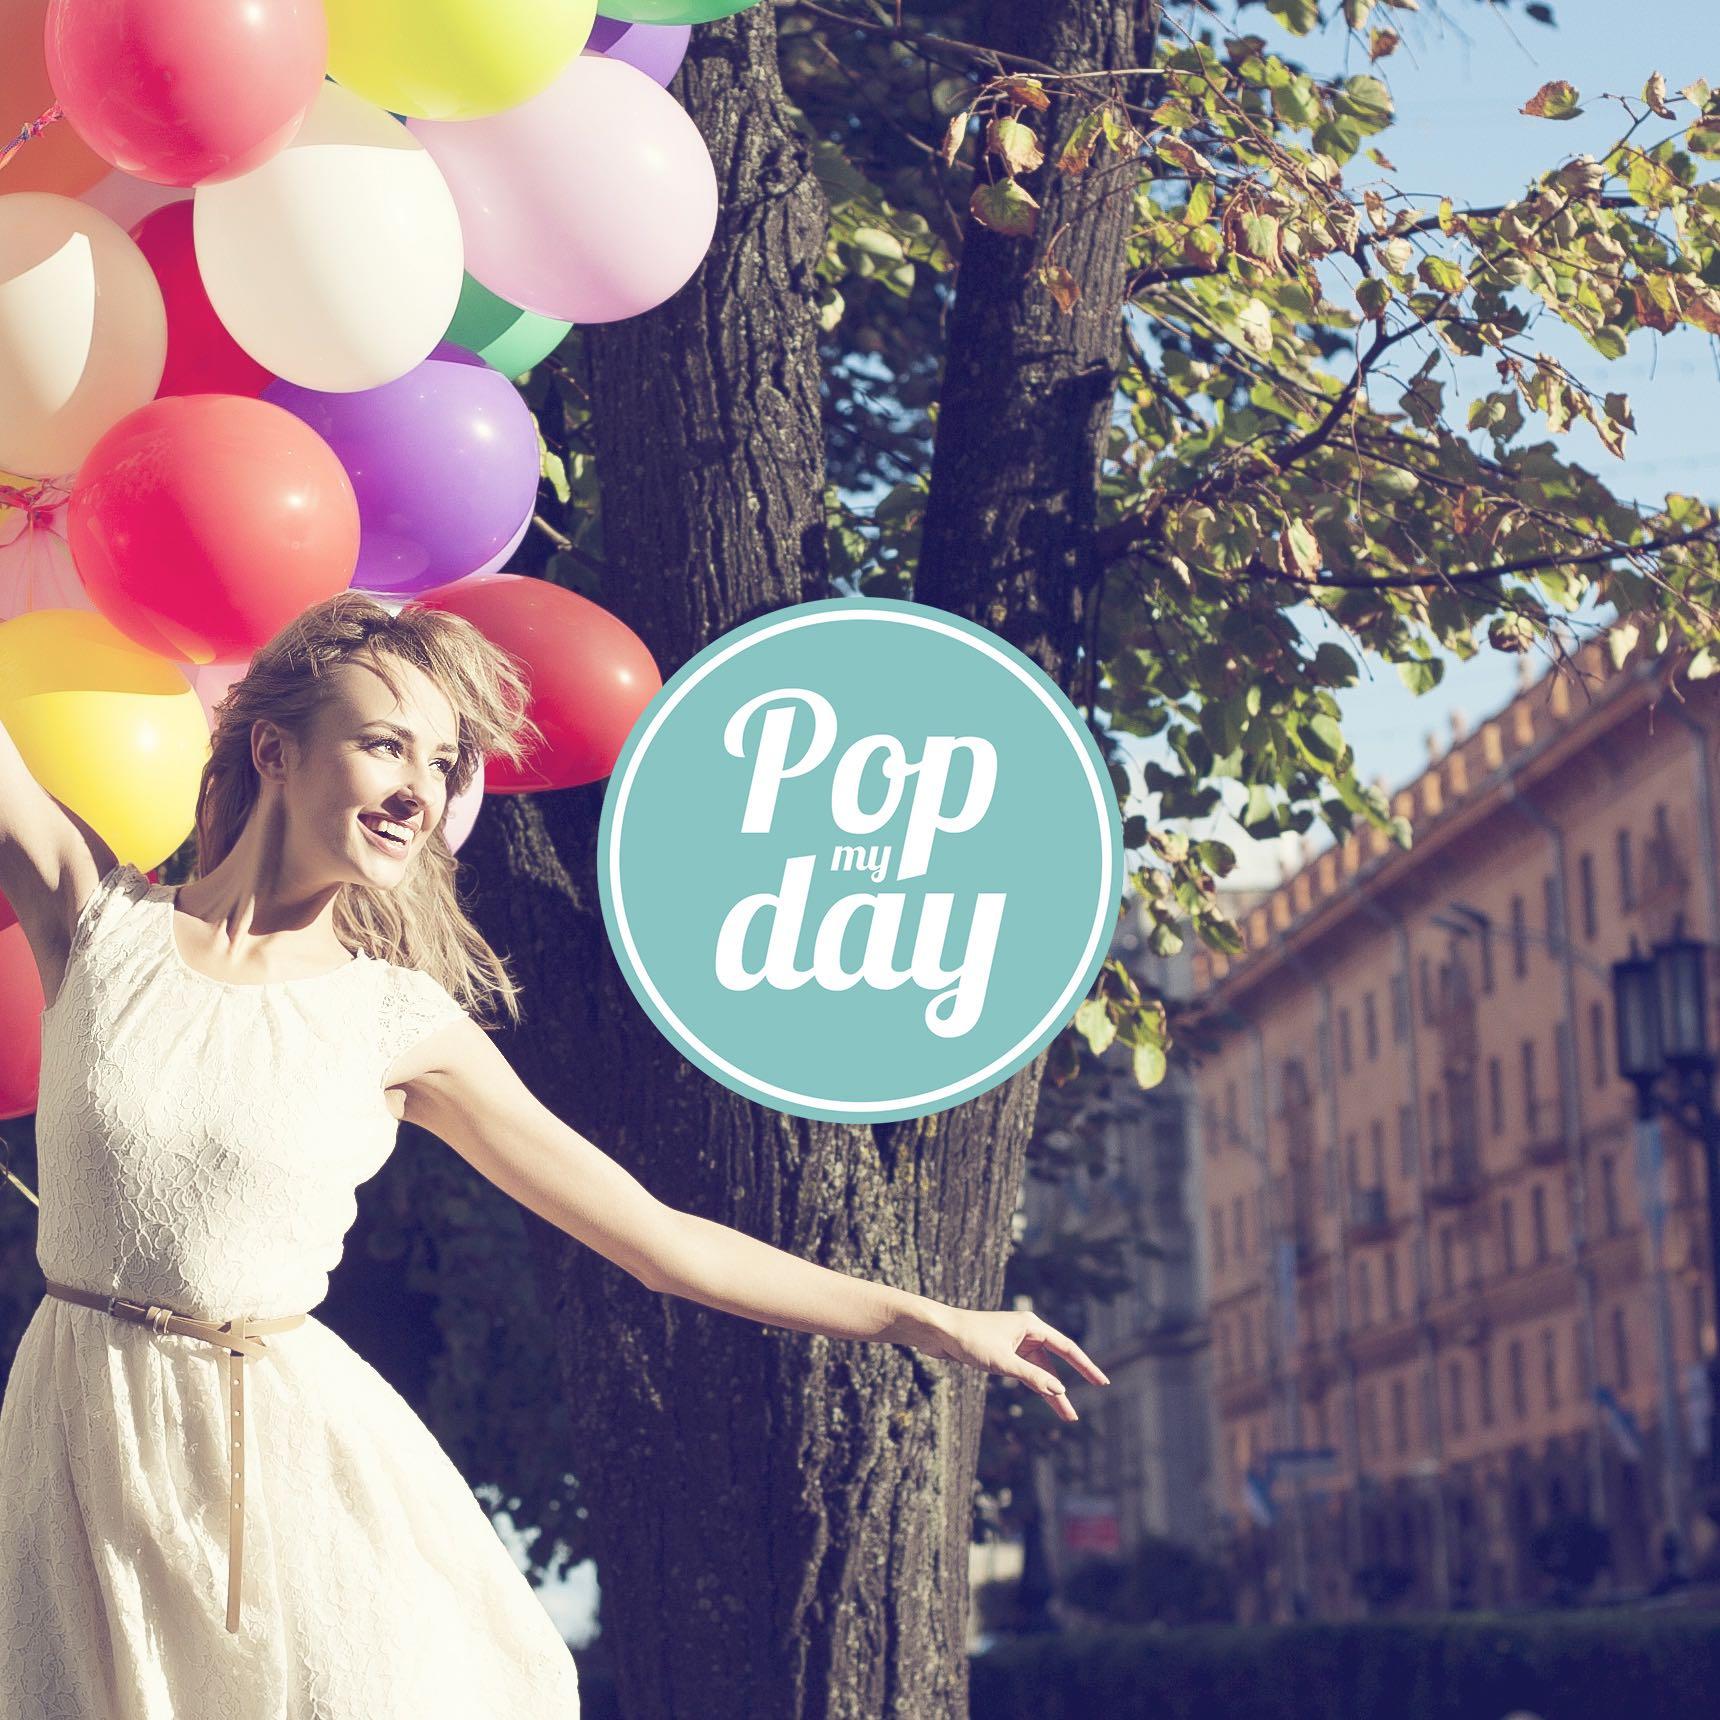 popmyday-appli-beaute-avis-test-code-promo